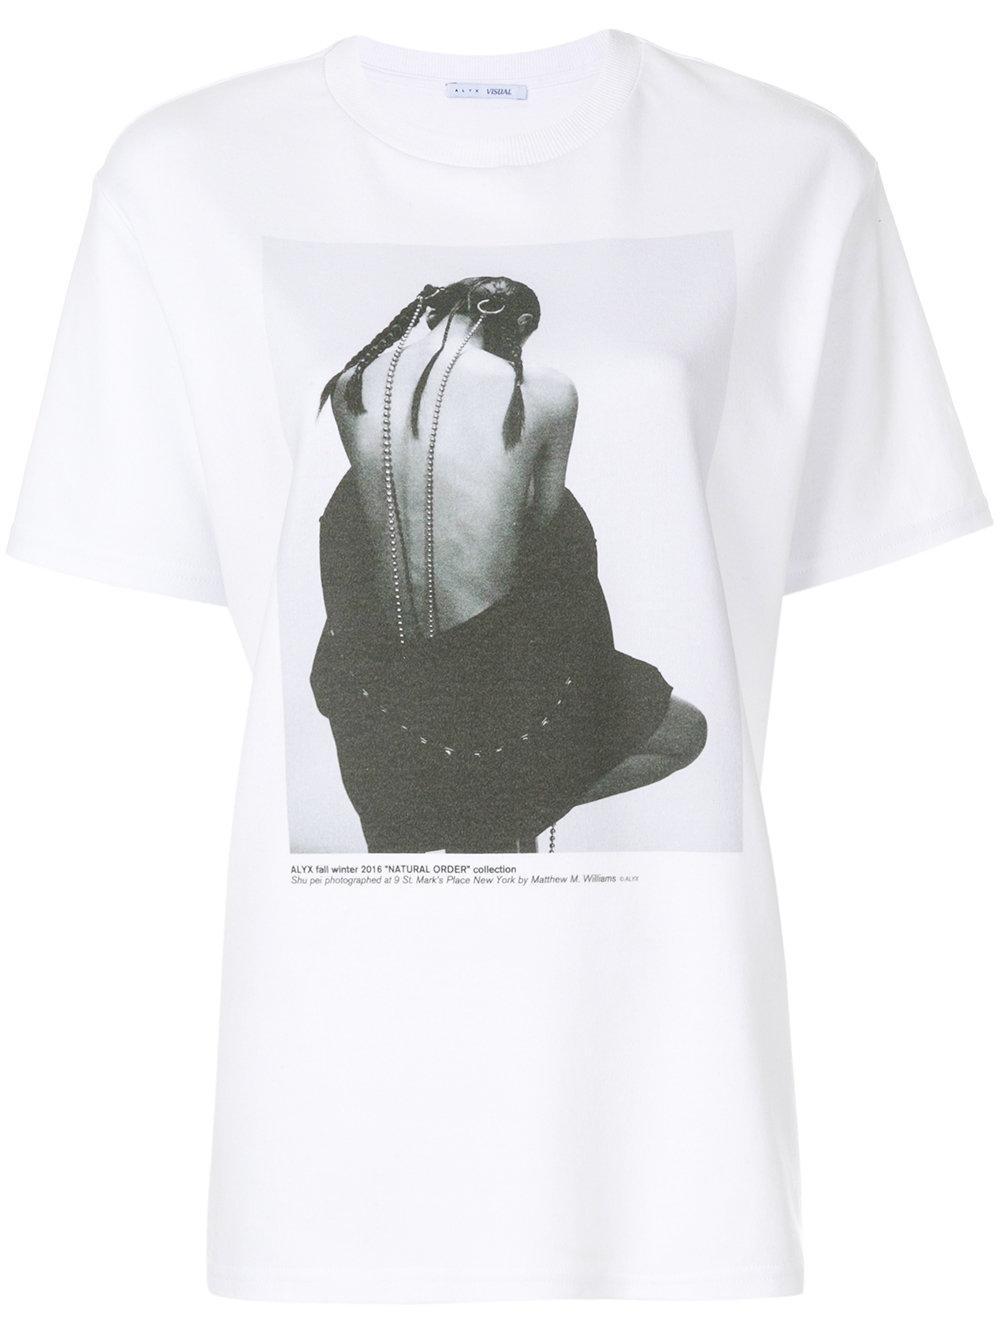 Alyx Photo Print T-shirt